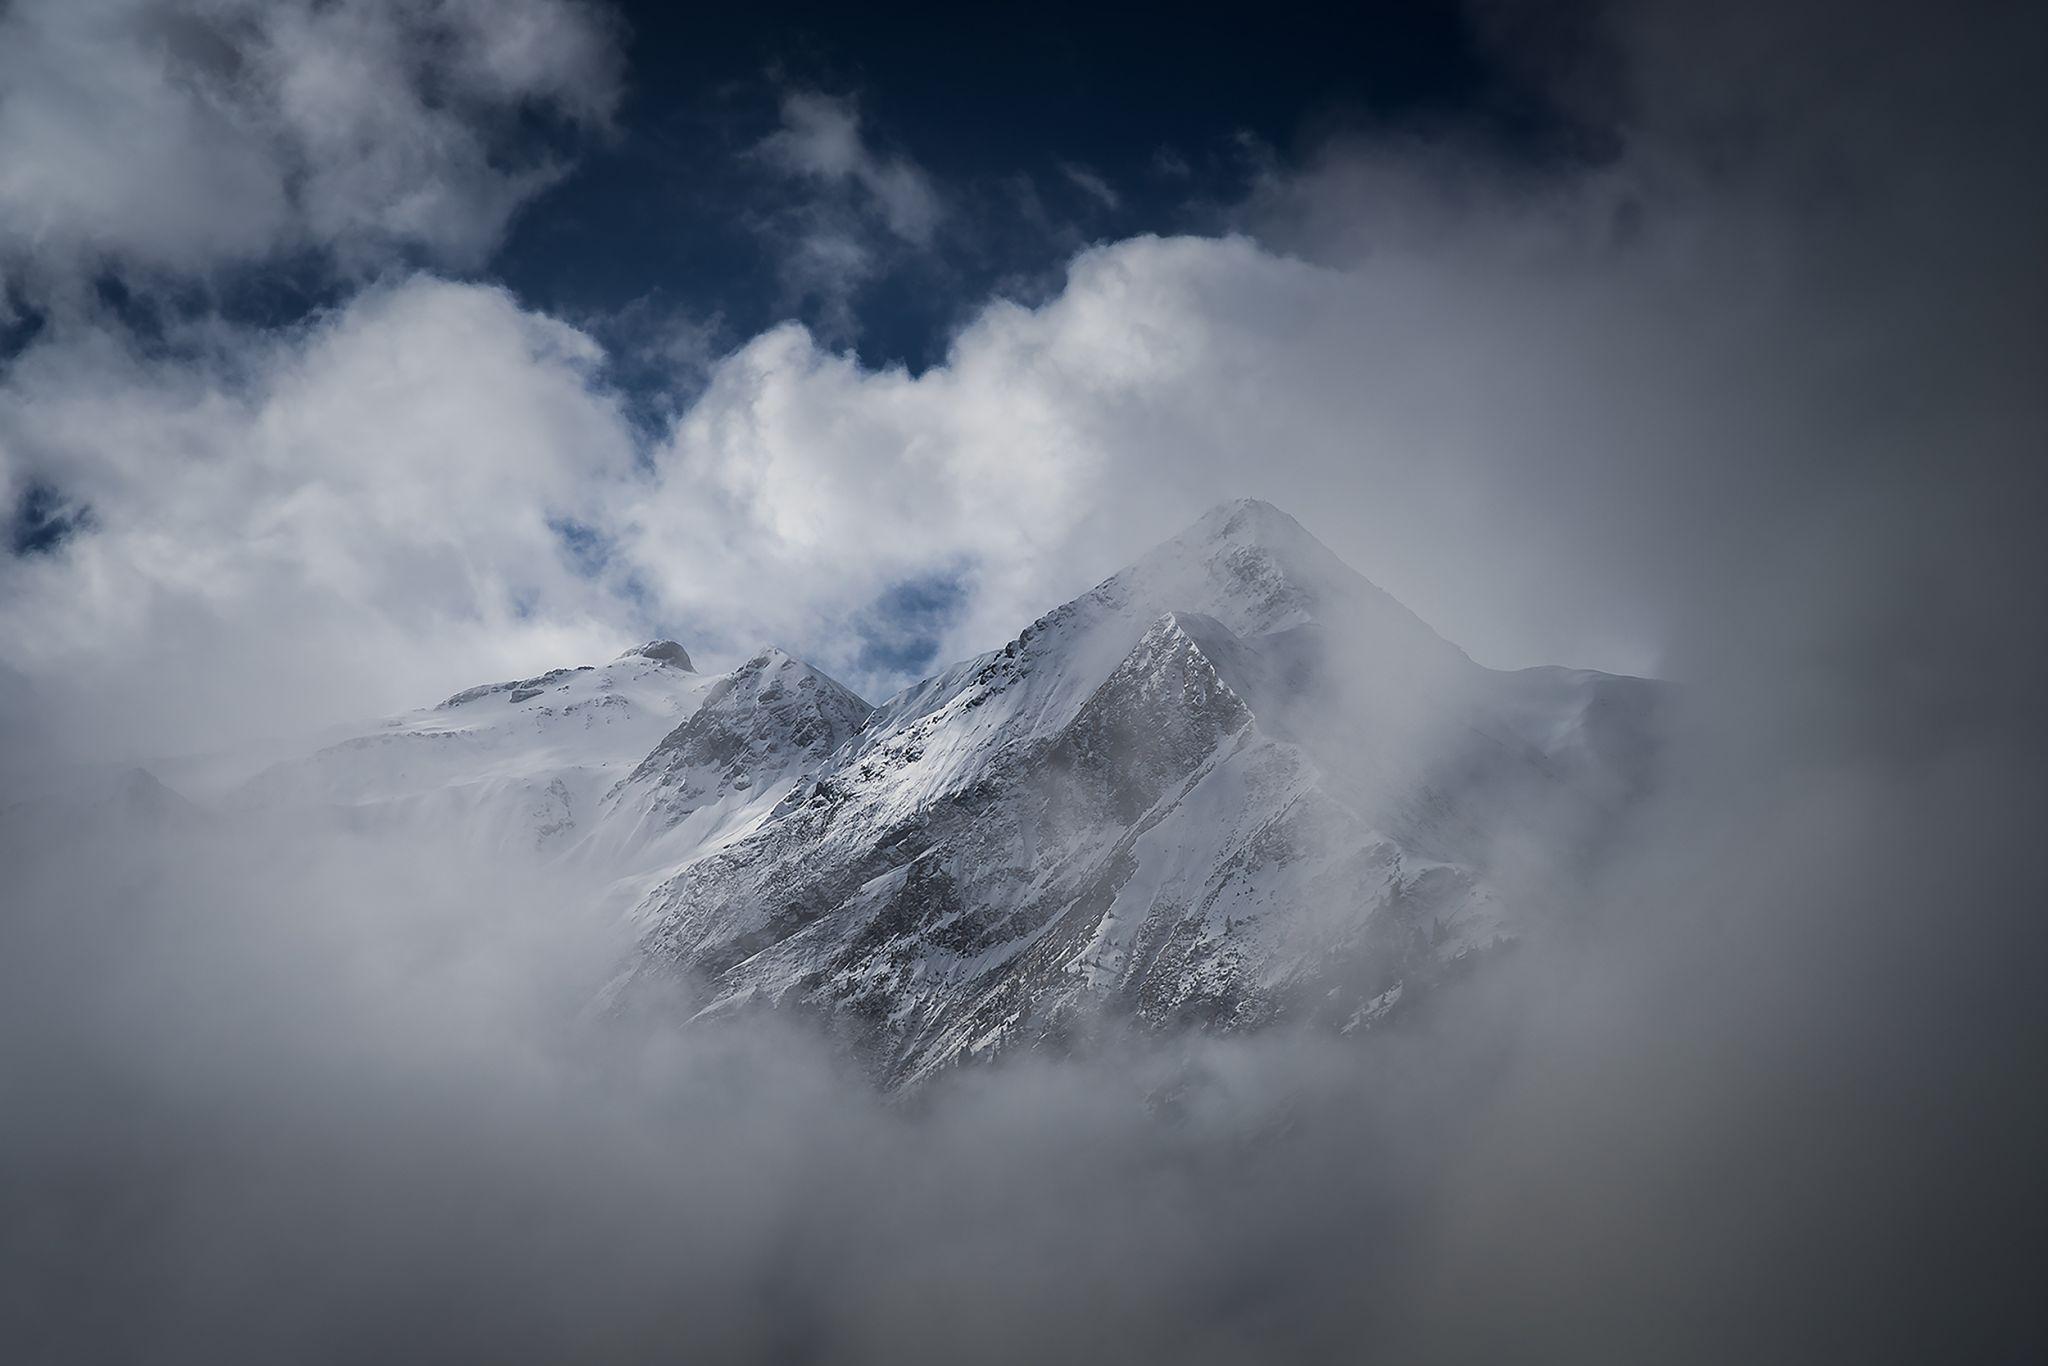 Val Lumnezia, Switzerland